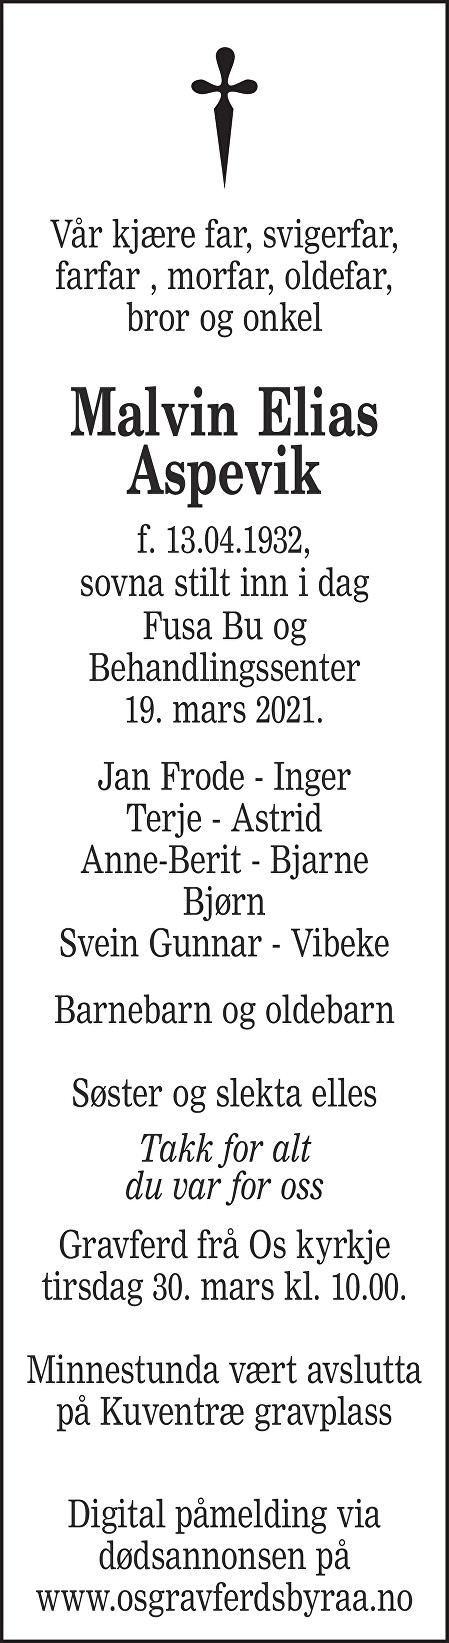 Malvin Elias Aspevik Dødsannonse